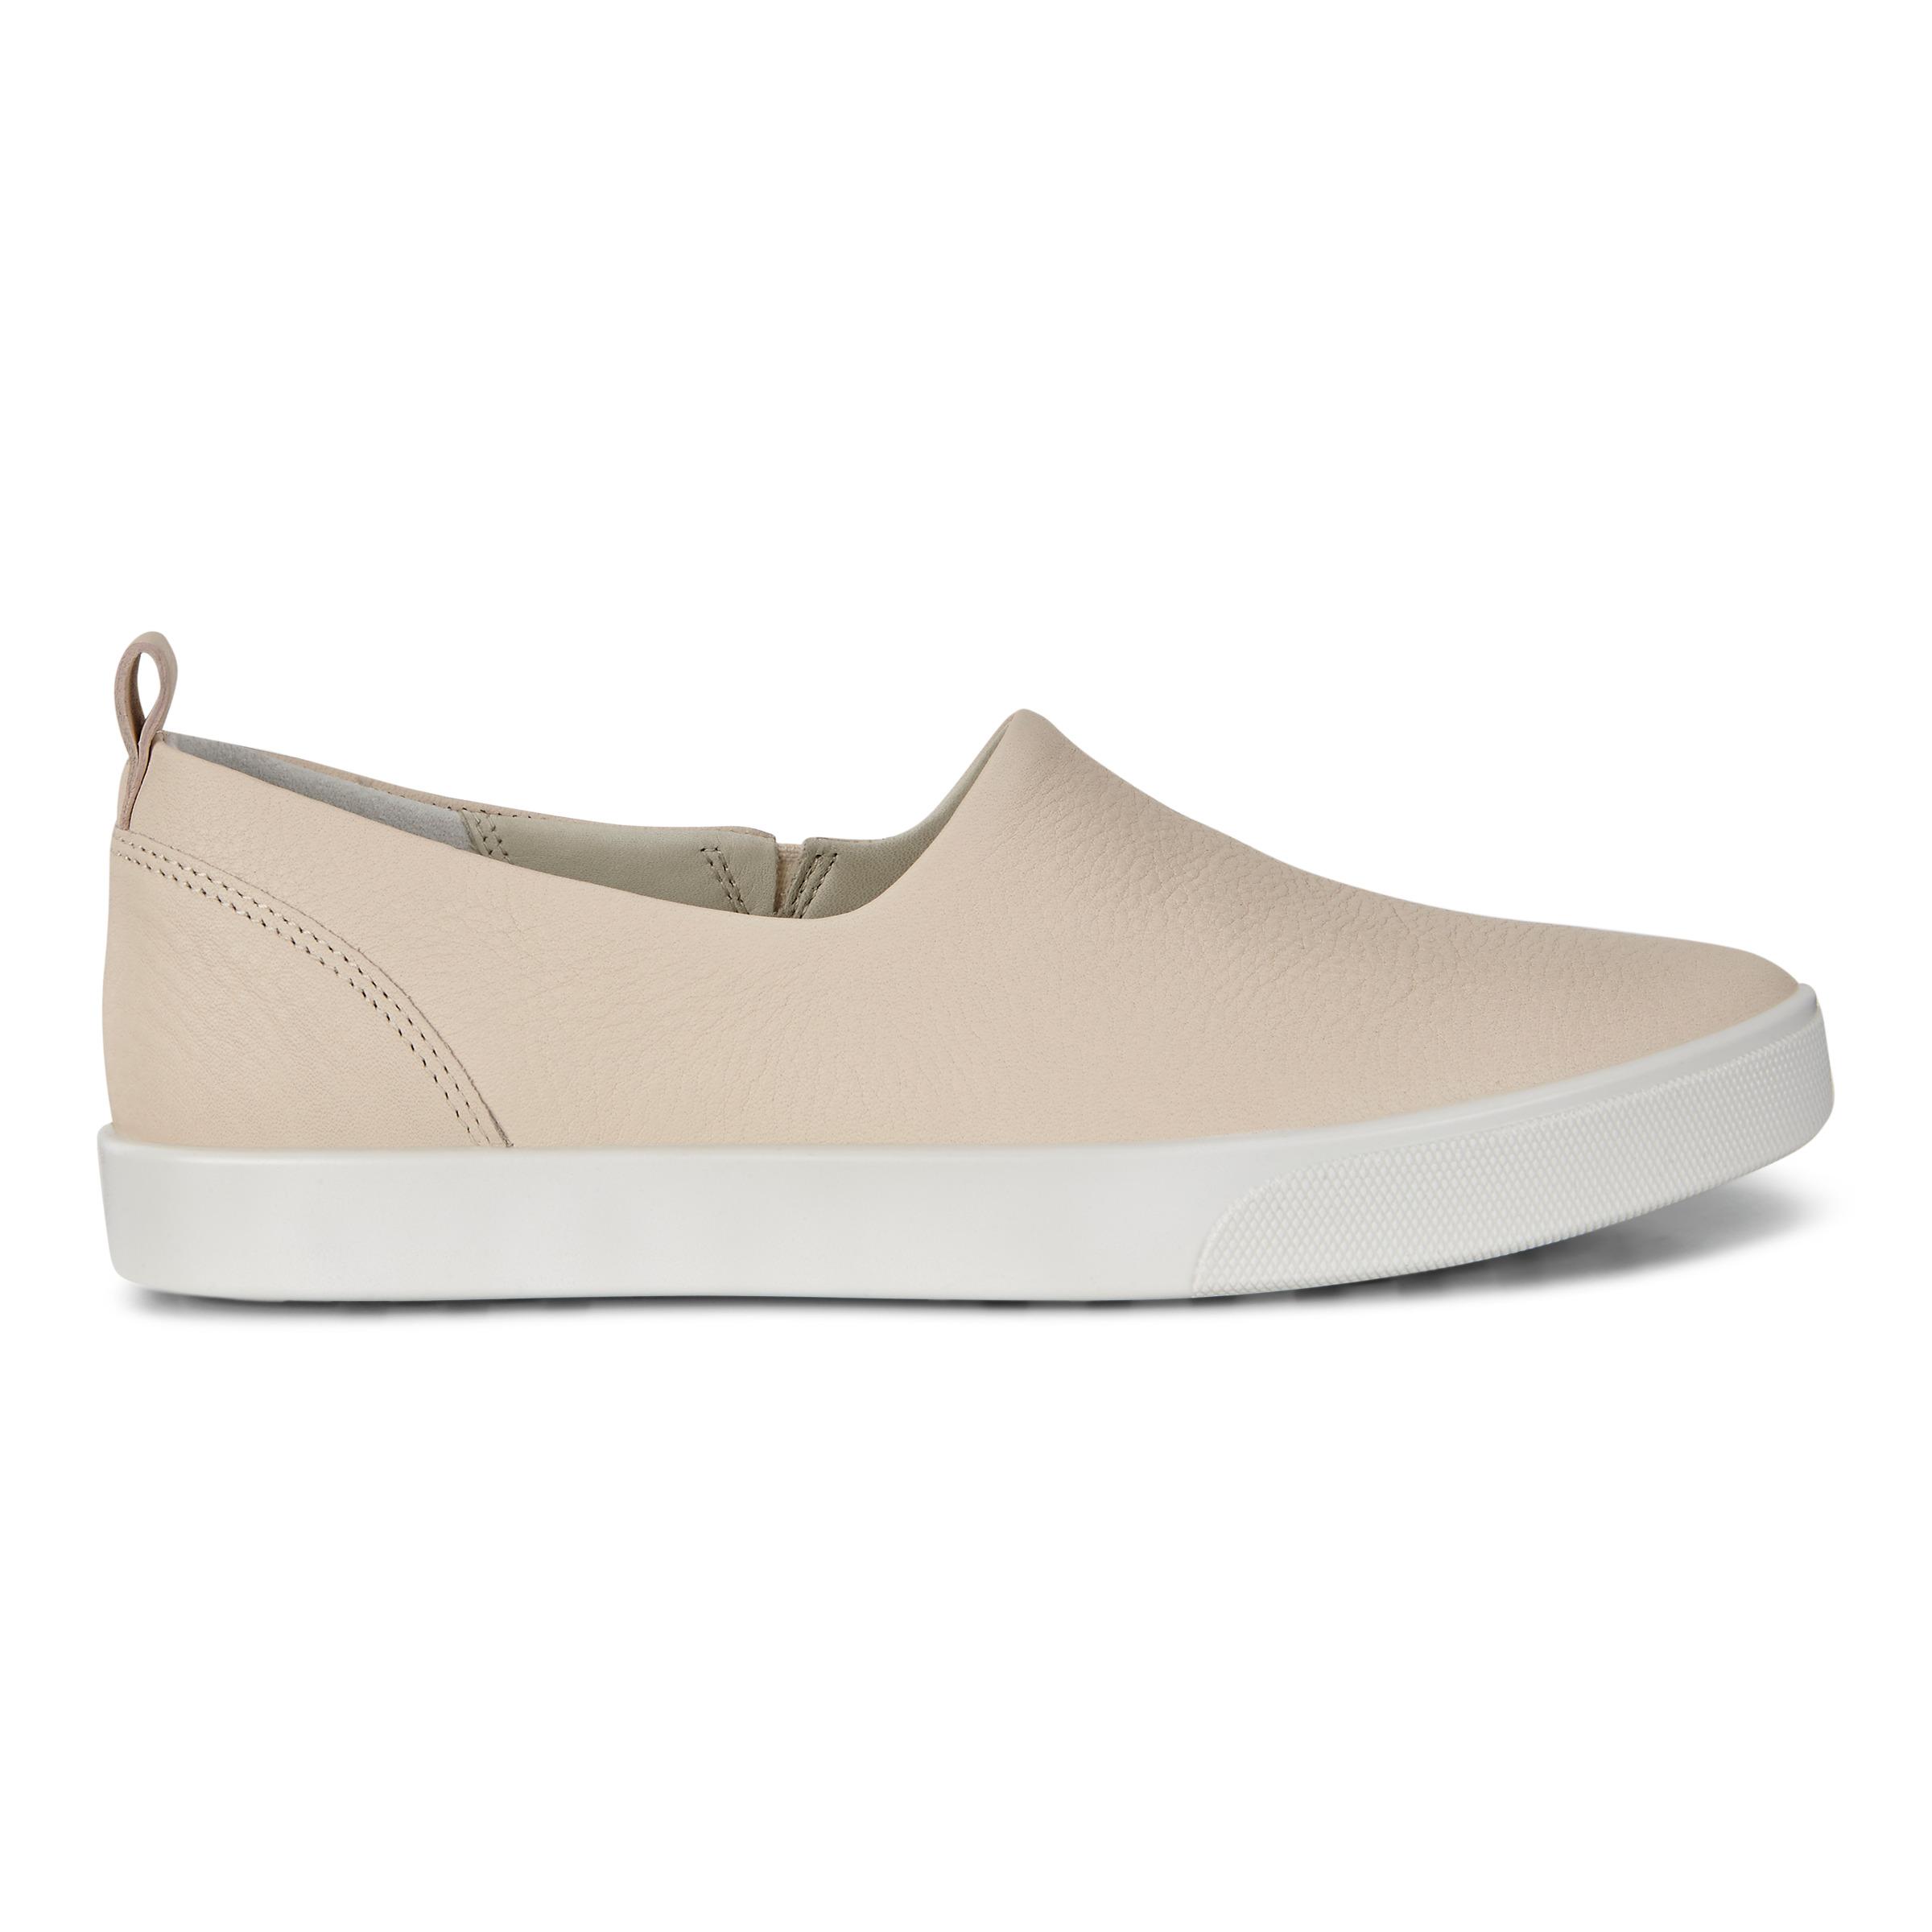 ECCO Gillian Slip On Sneakers Size 6-6.5 Vanilla